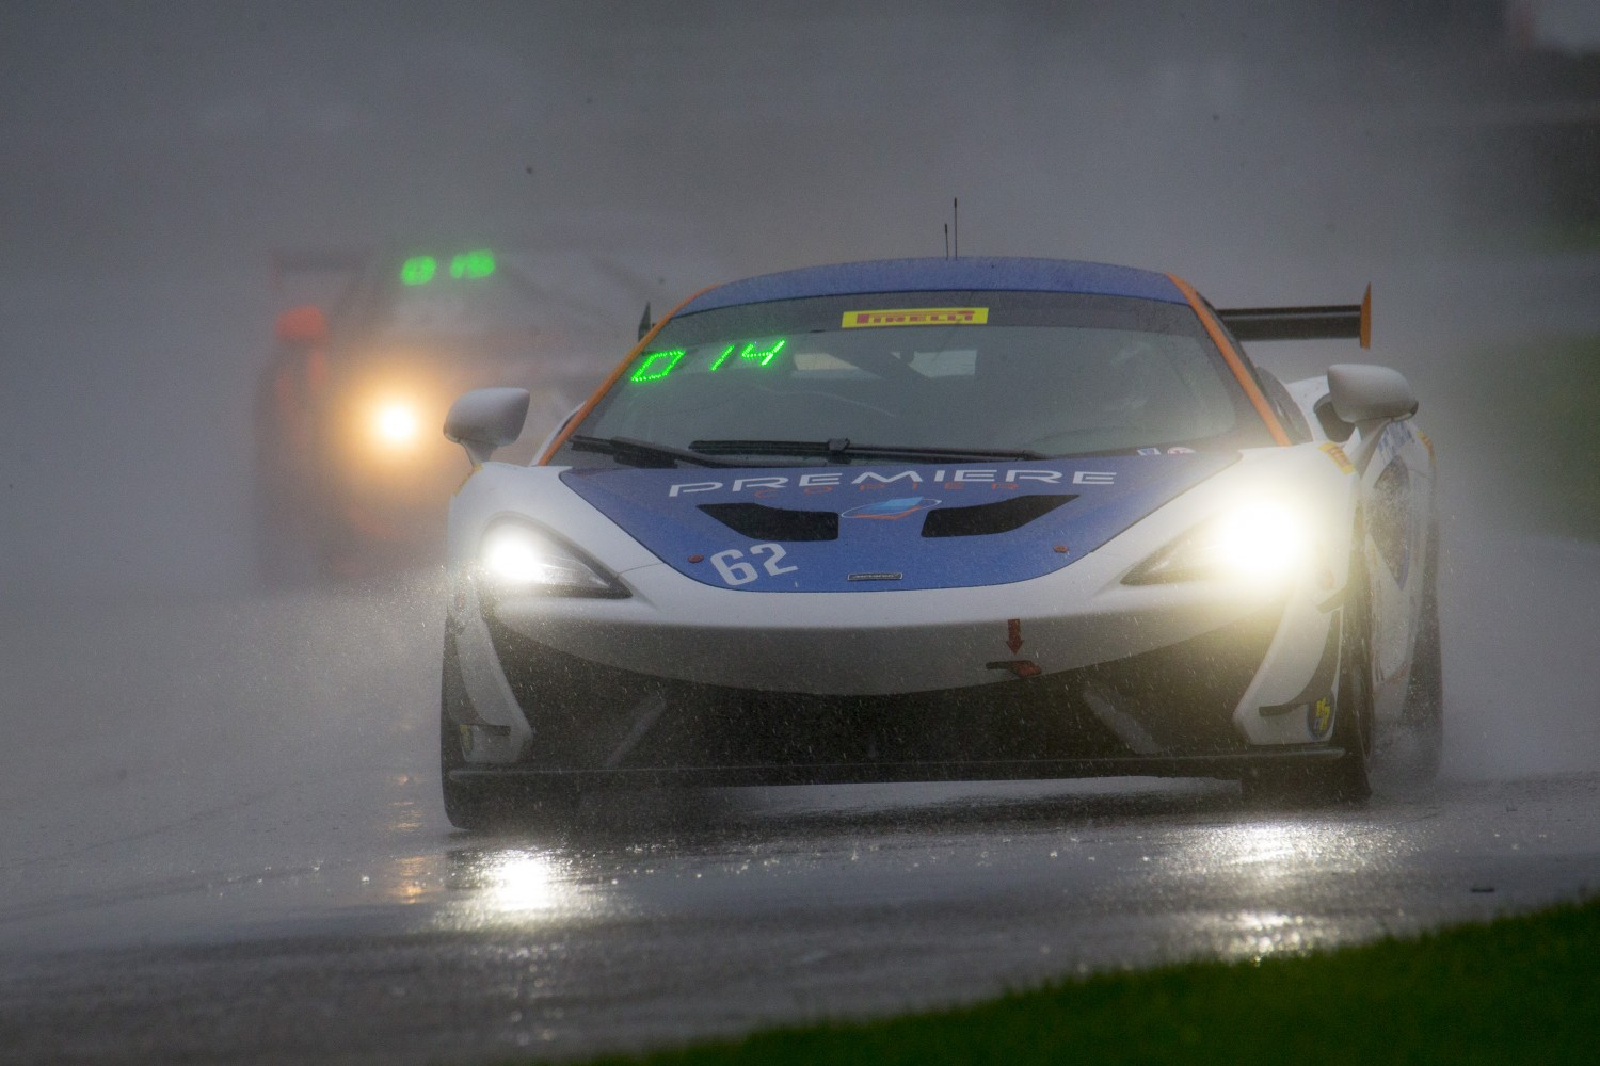 #62 McLaren 570S GT4, Mark Klenin, KFR, SRO Pirelli GT4 America, Road America, September 2019.